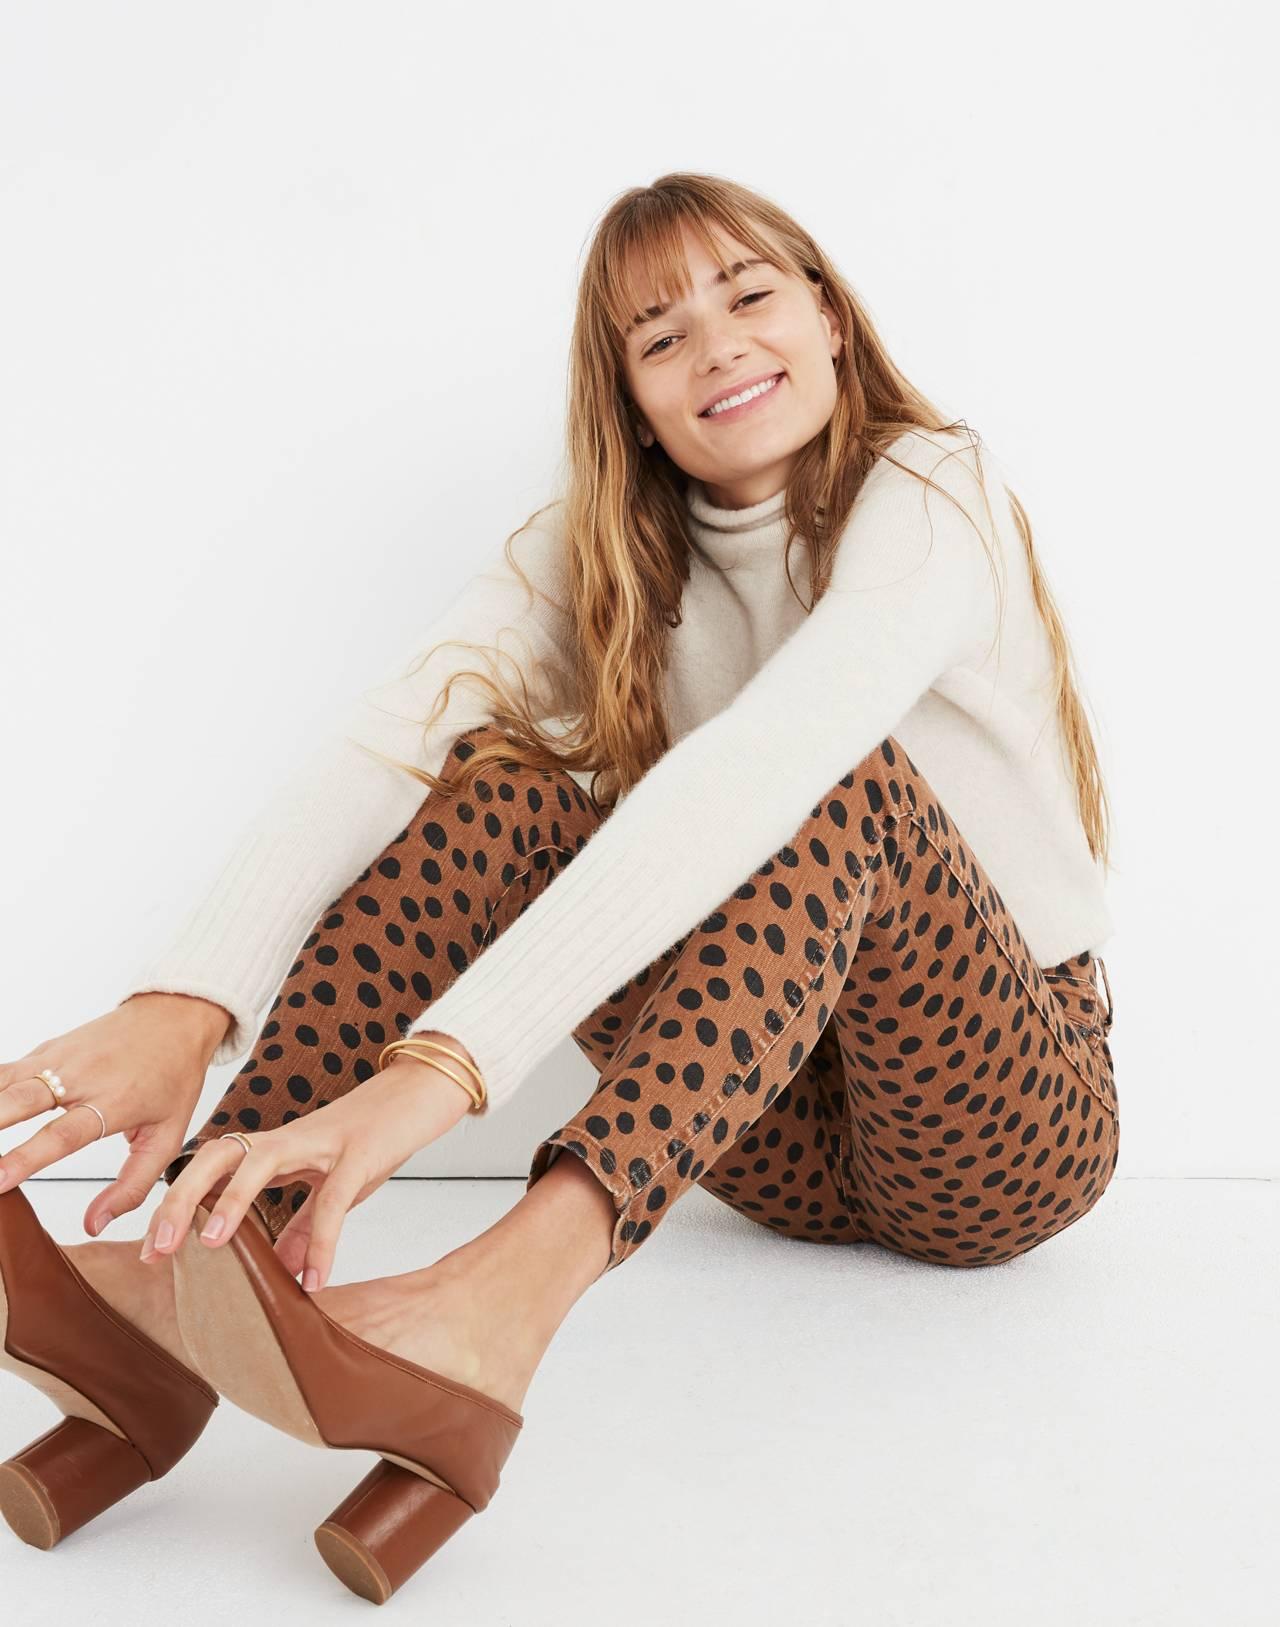 "10"" High-Rise Skinny Jeans in Leopard Dot in leopard dot image 2"